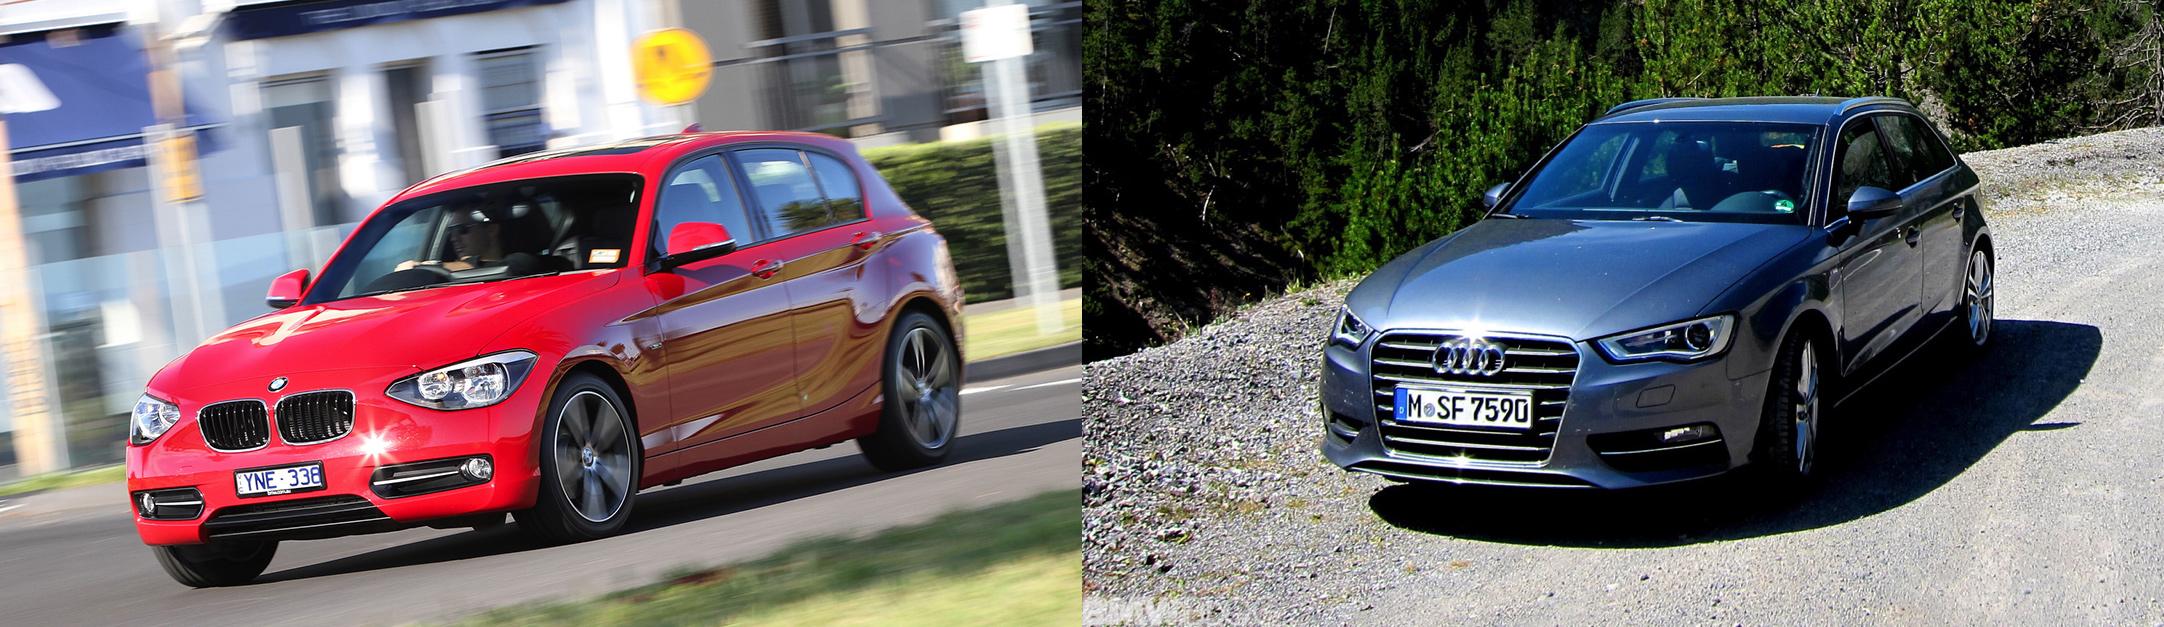 BMW 118d vs Audi A3 Sportback S Line 2.0 TDI  Audi A S Line Package Tdi on